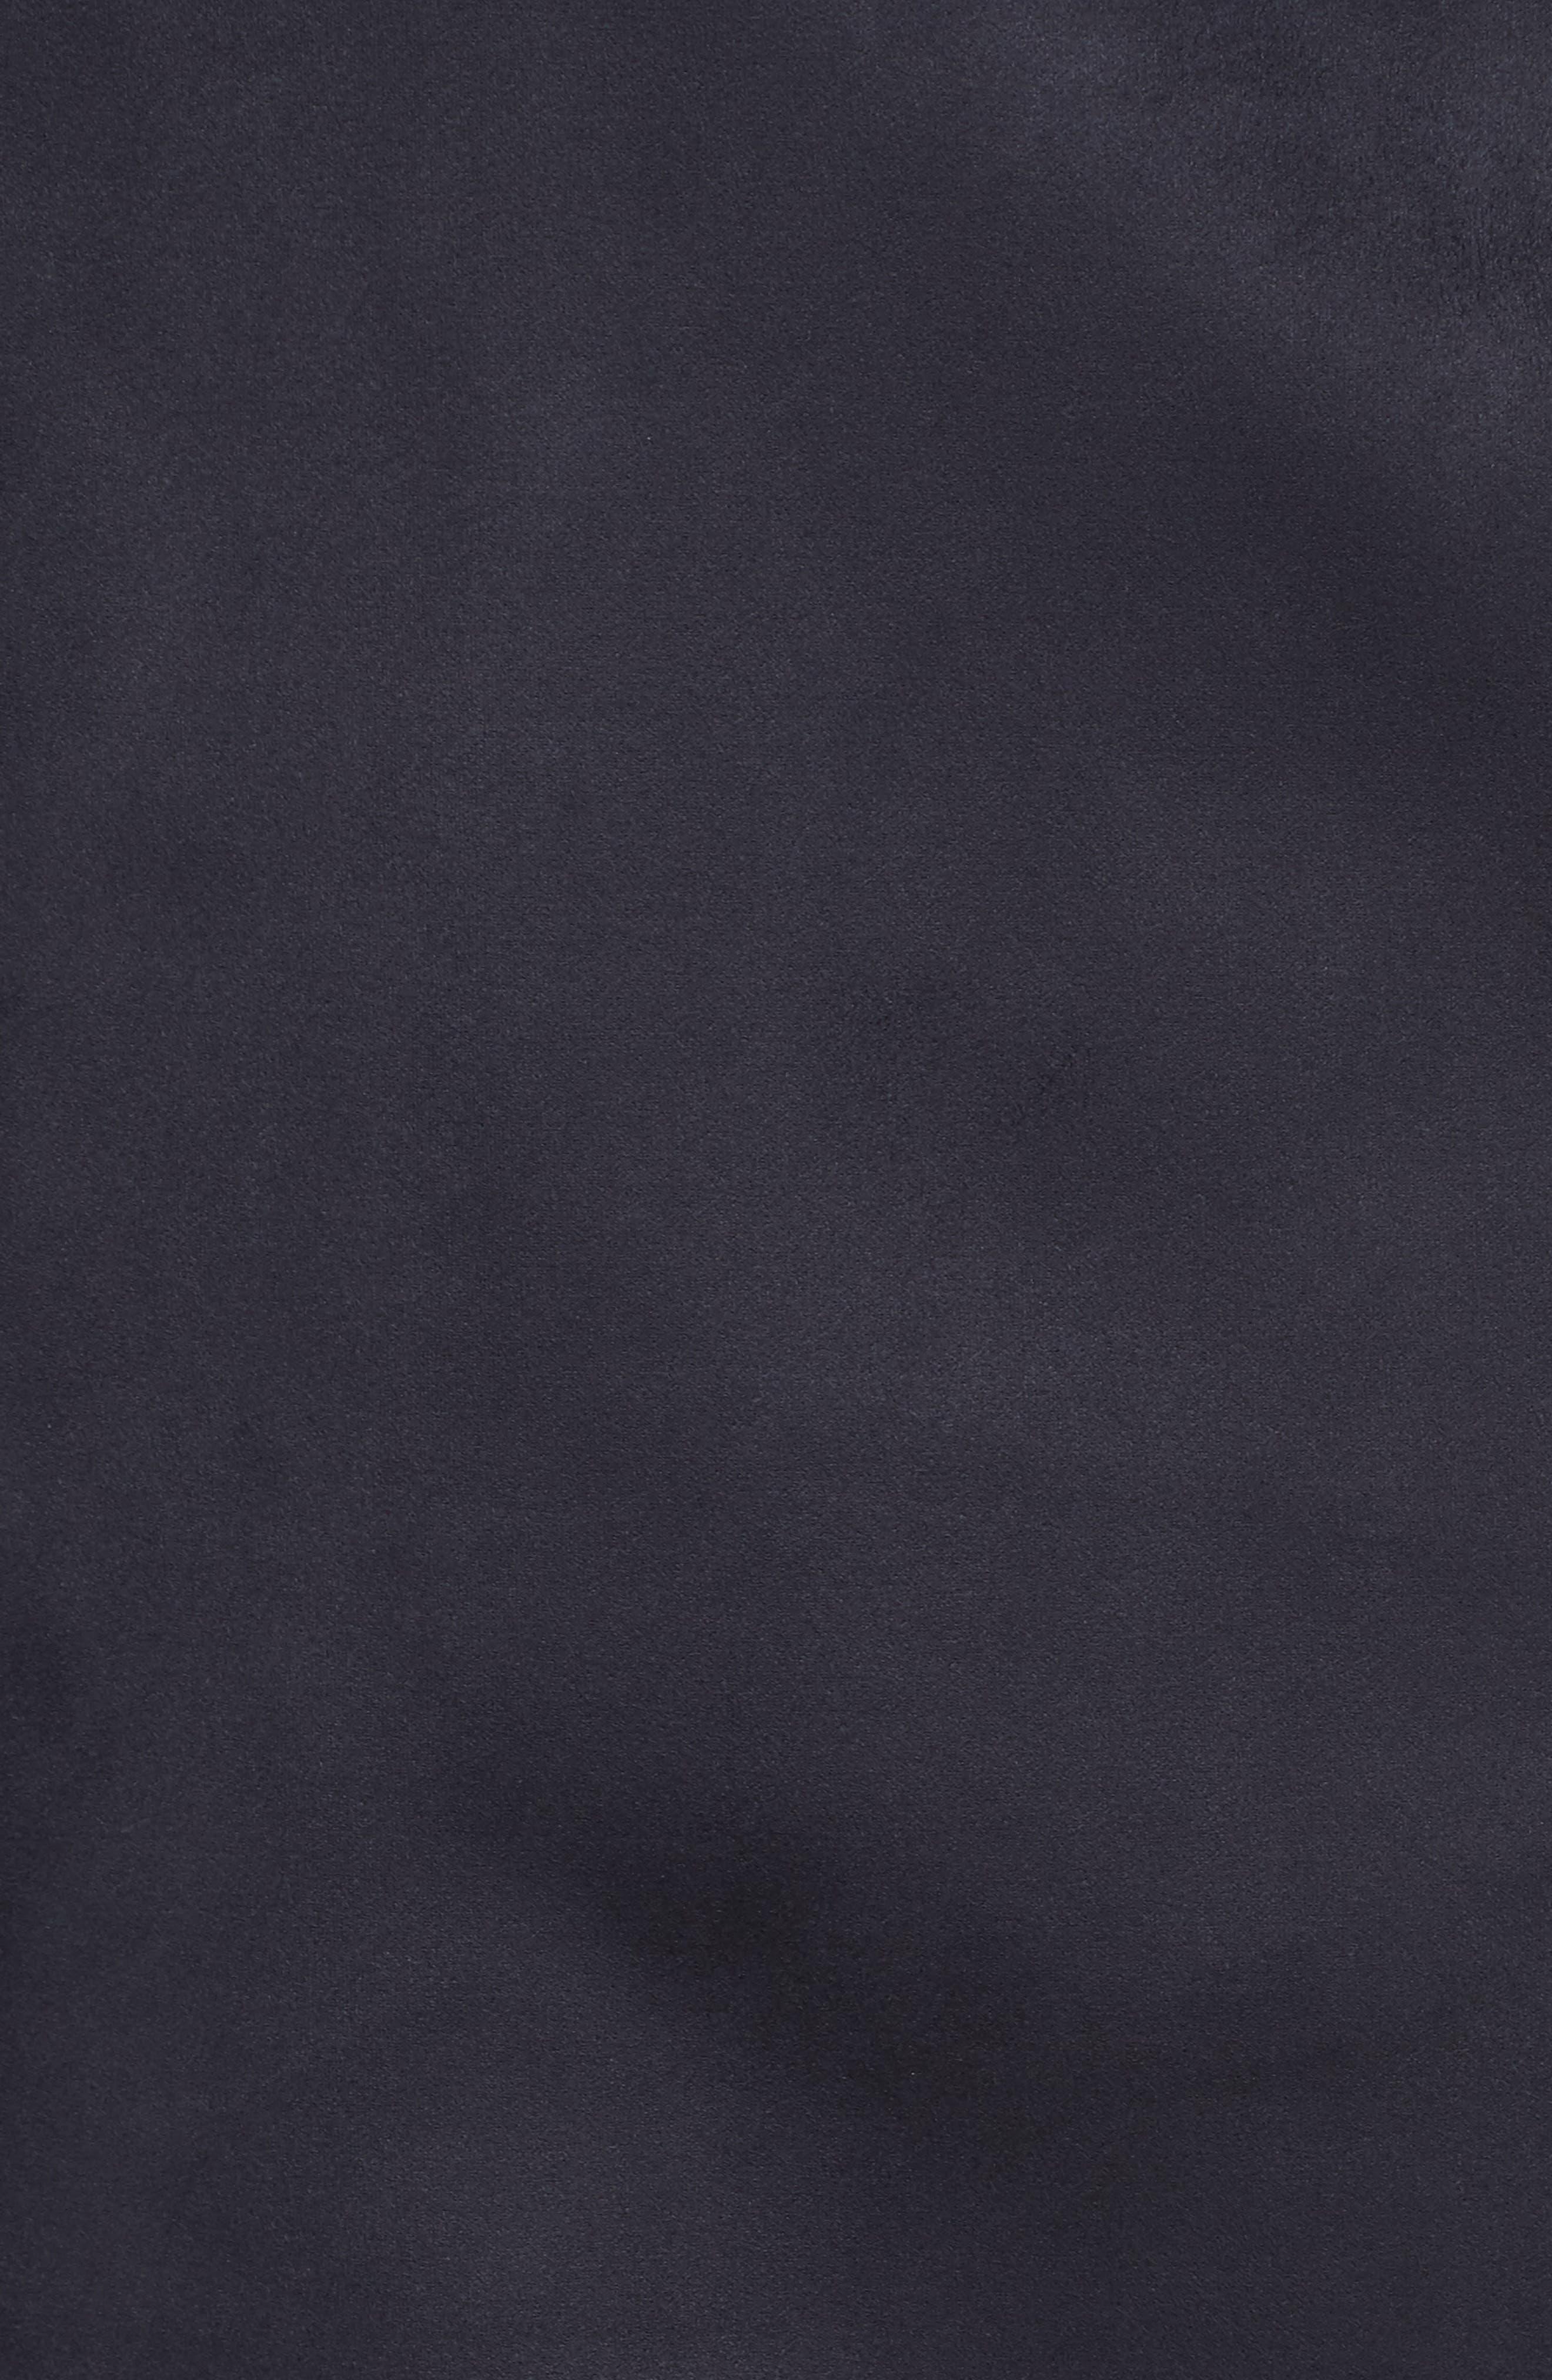 Alternate Image 5  - Persona by Marina Rinaldi Napoli Faux Sude Duster Jacket (Plus Size)